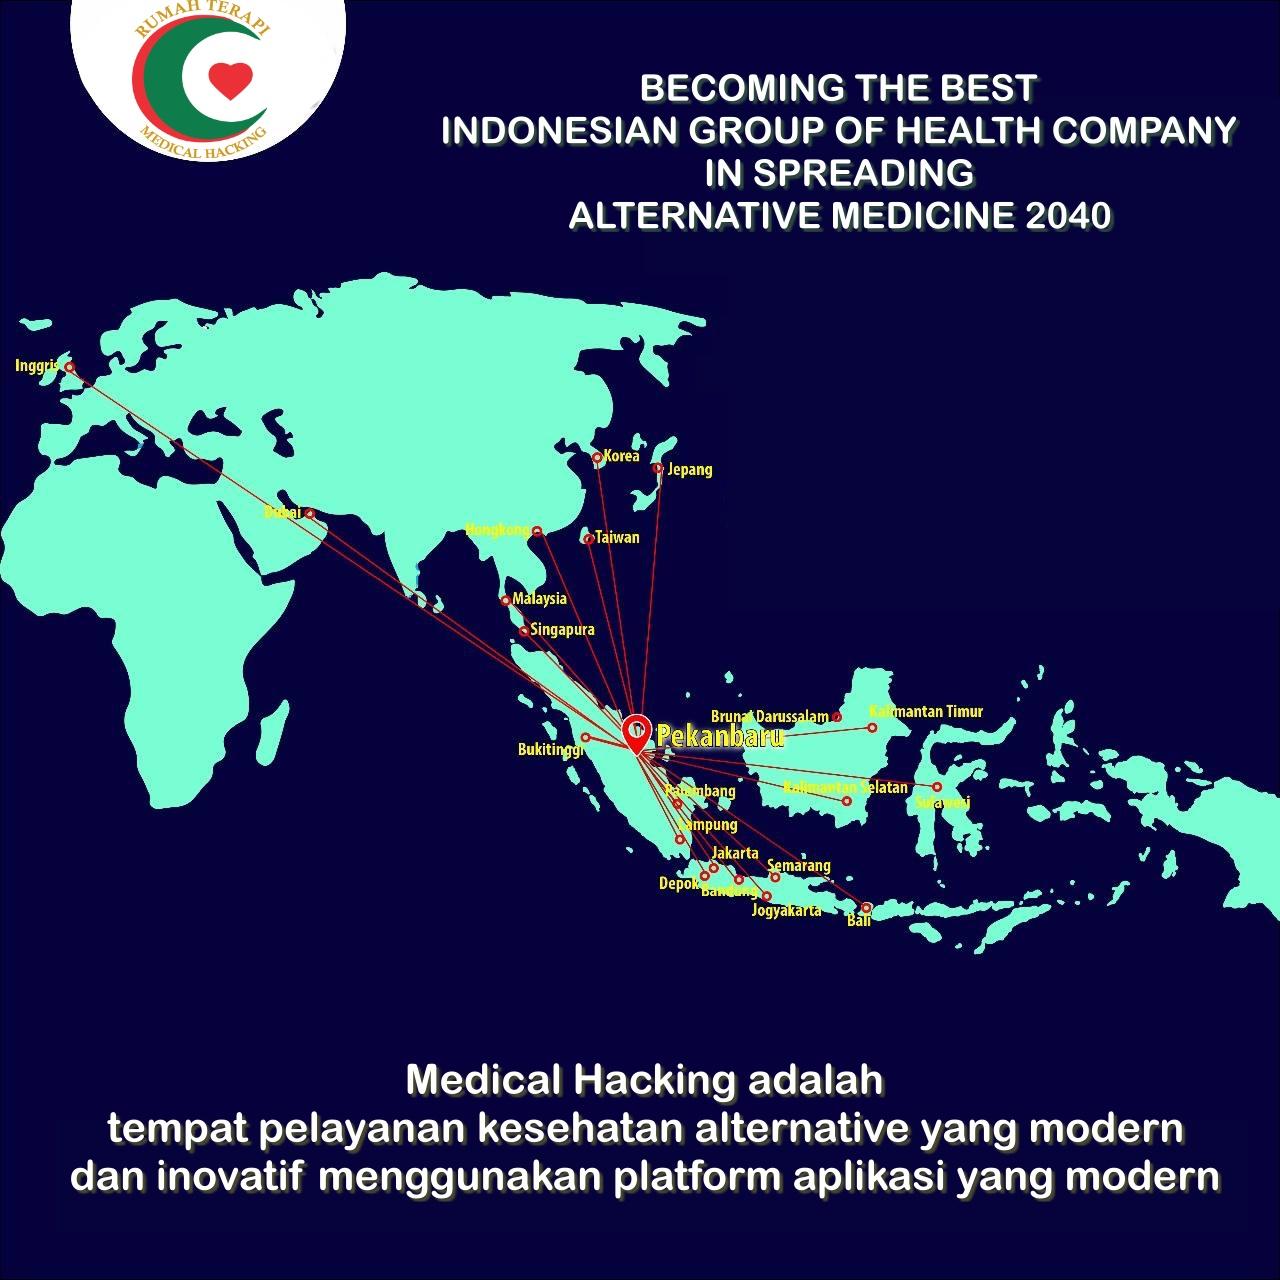 visi medical hacking indonesia